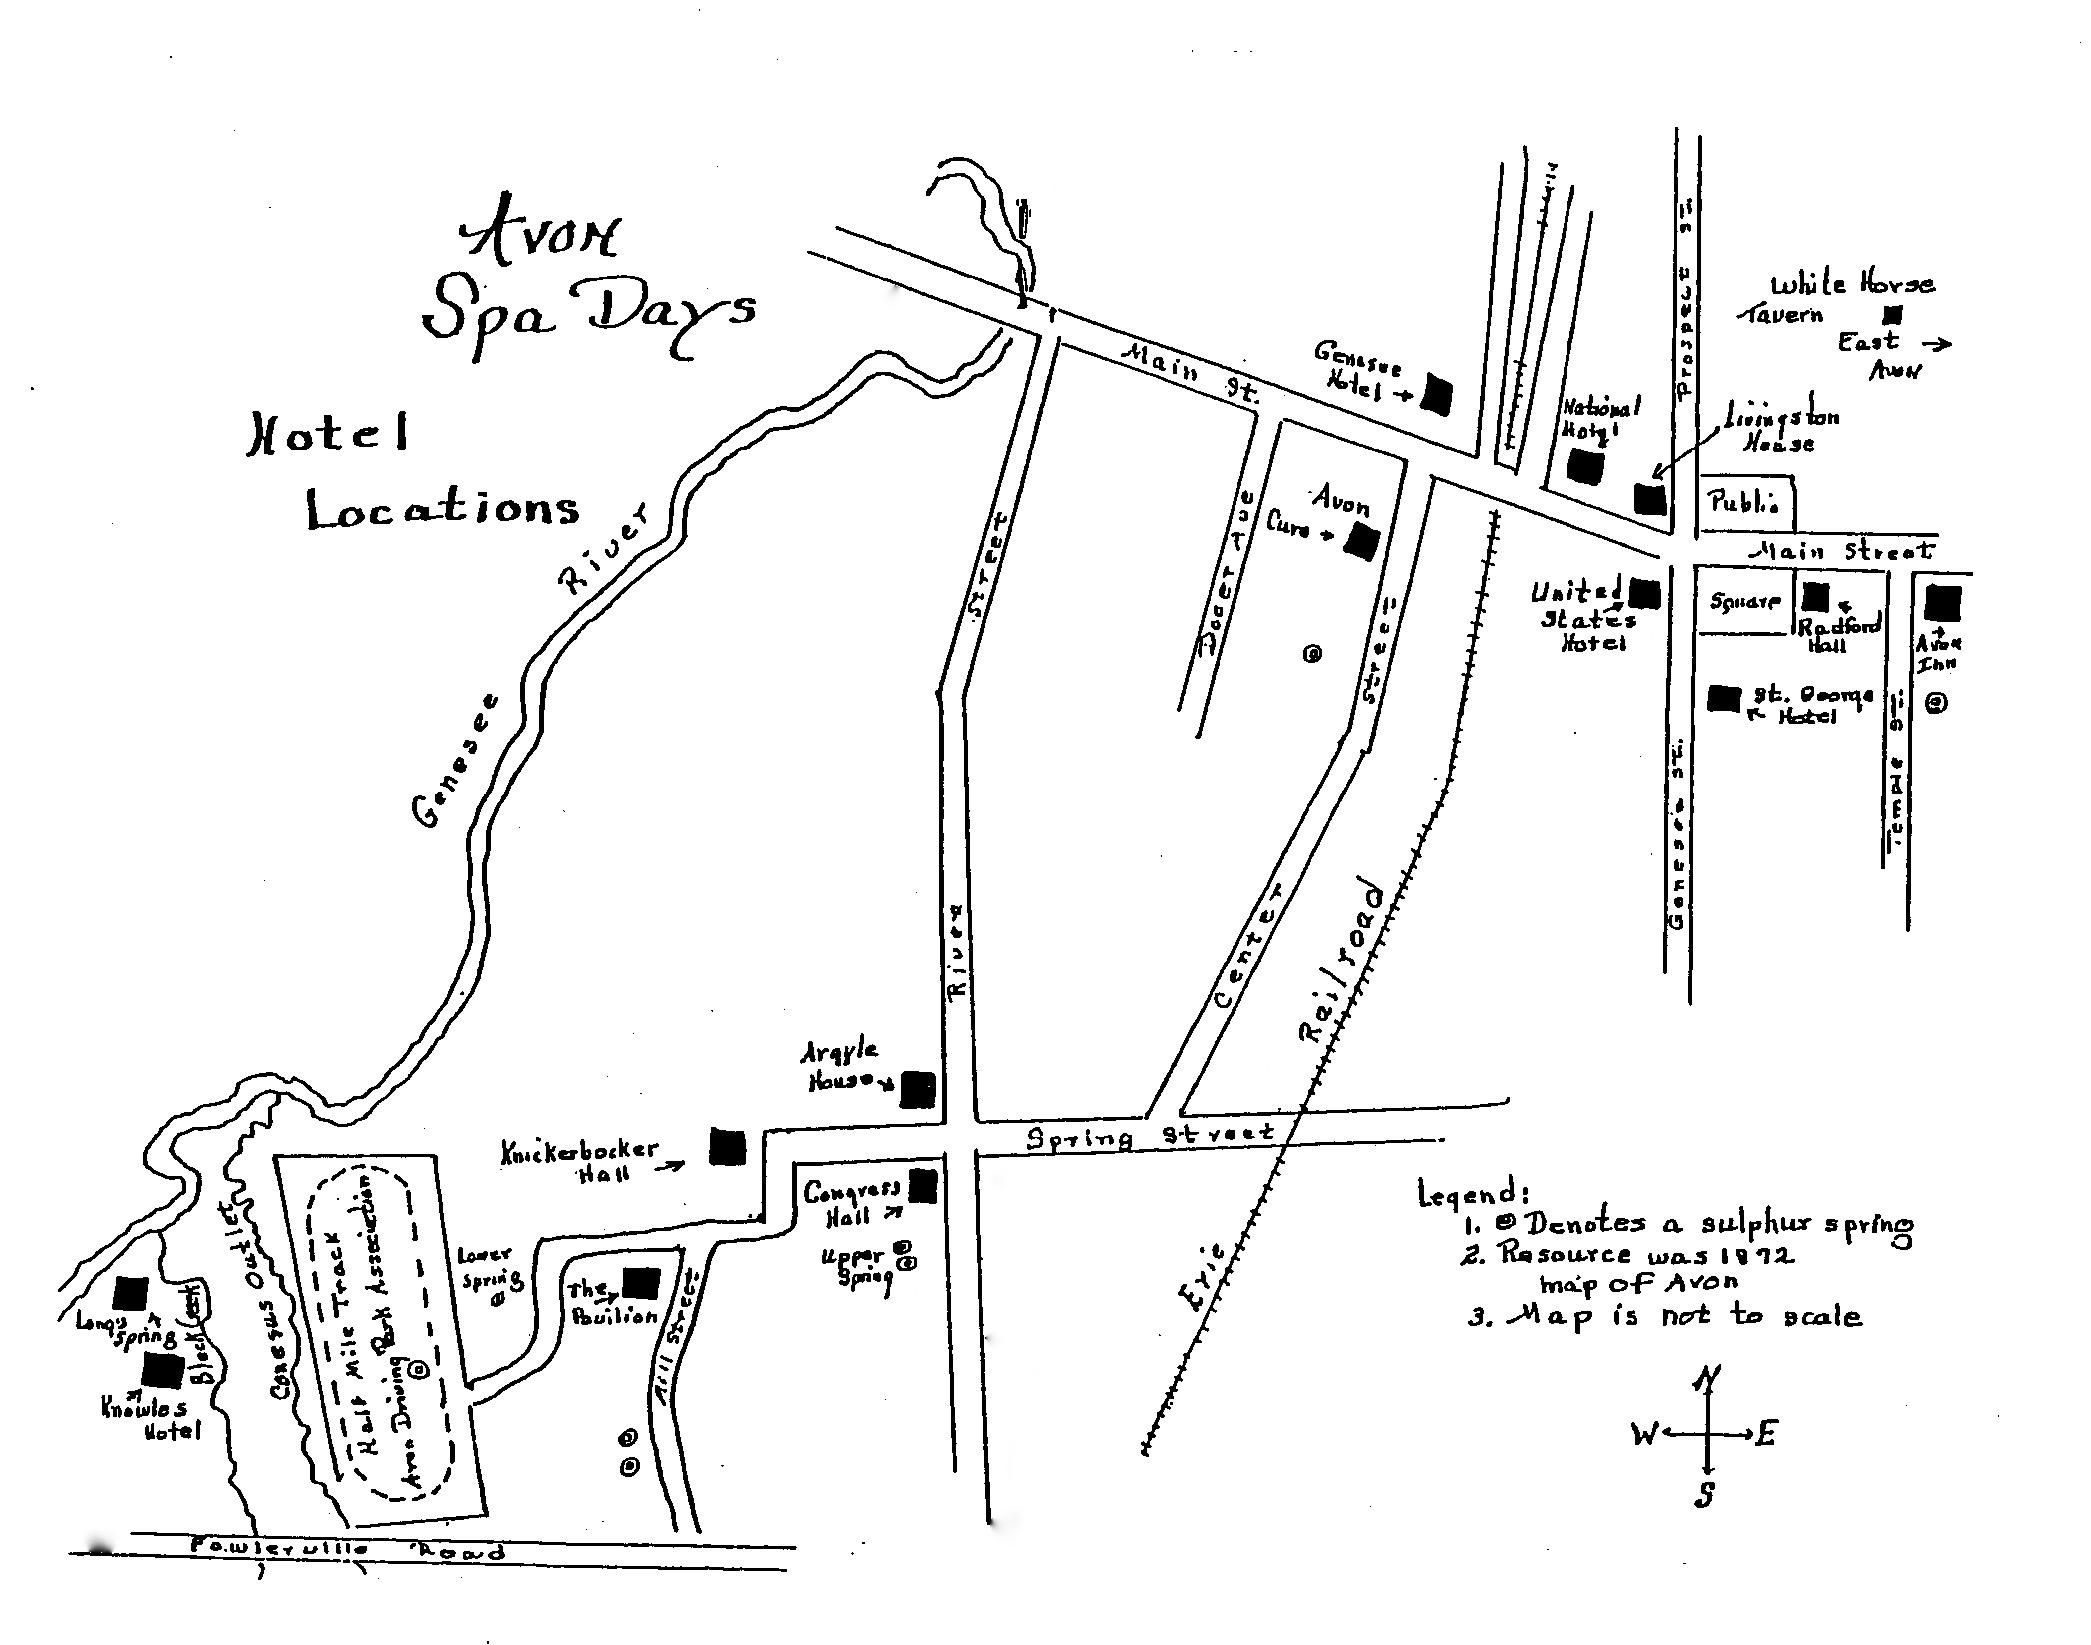 Spa Map. Source: Avon Town Historian